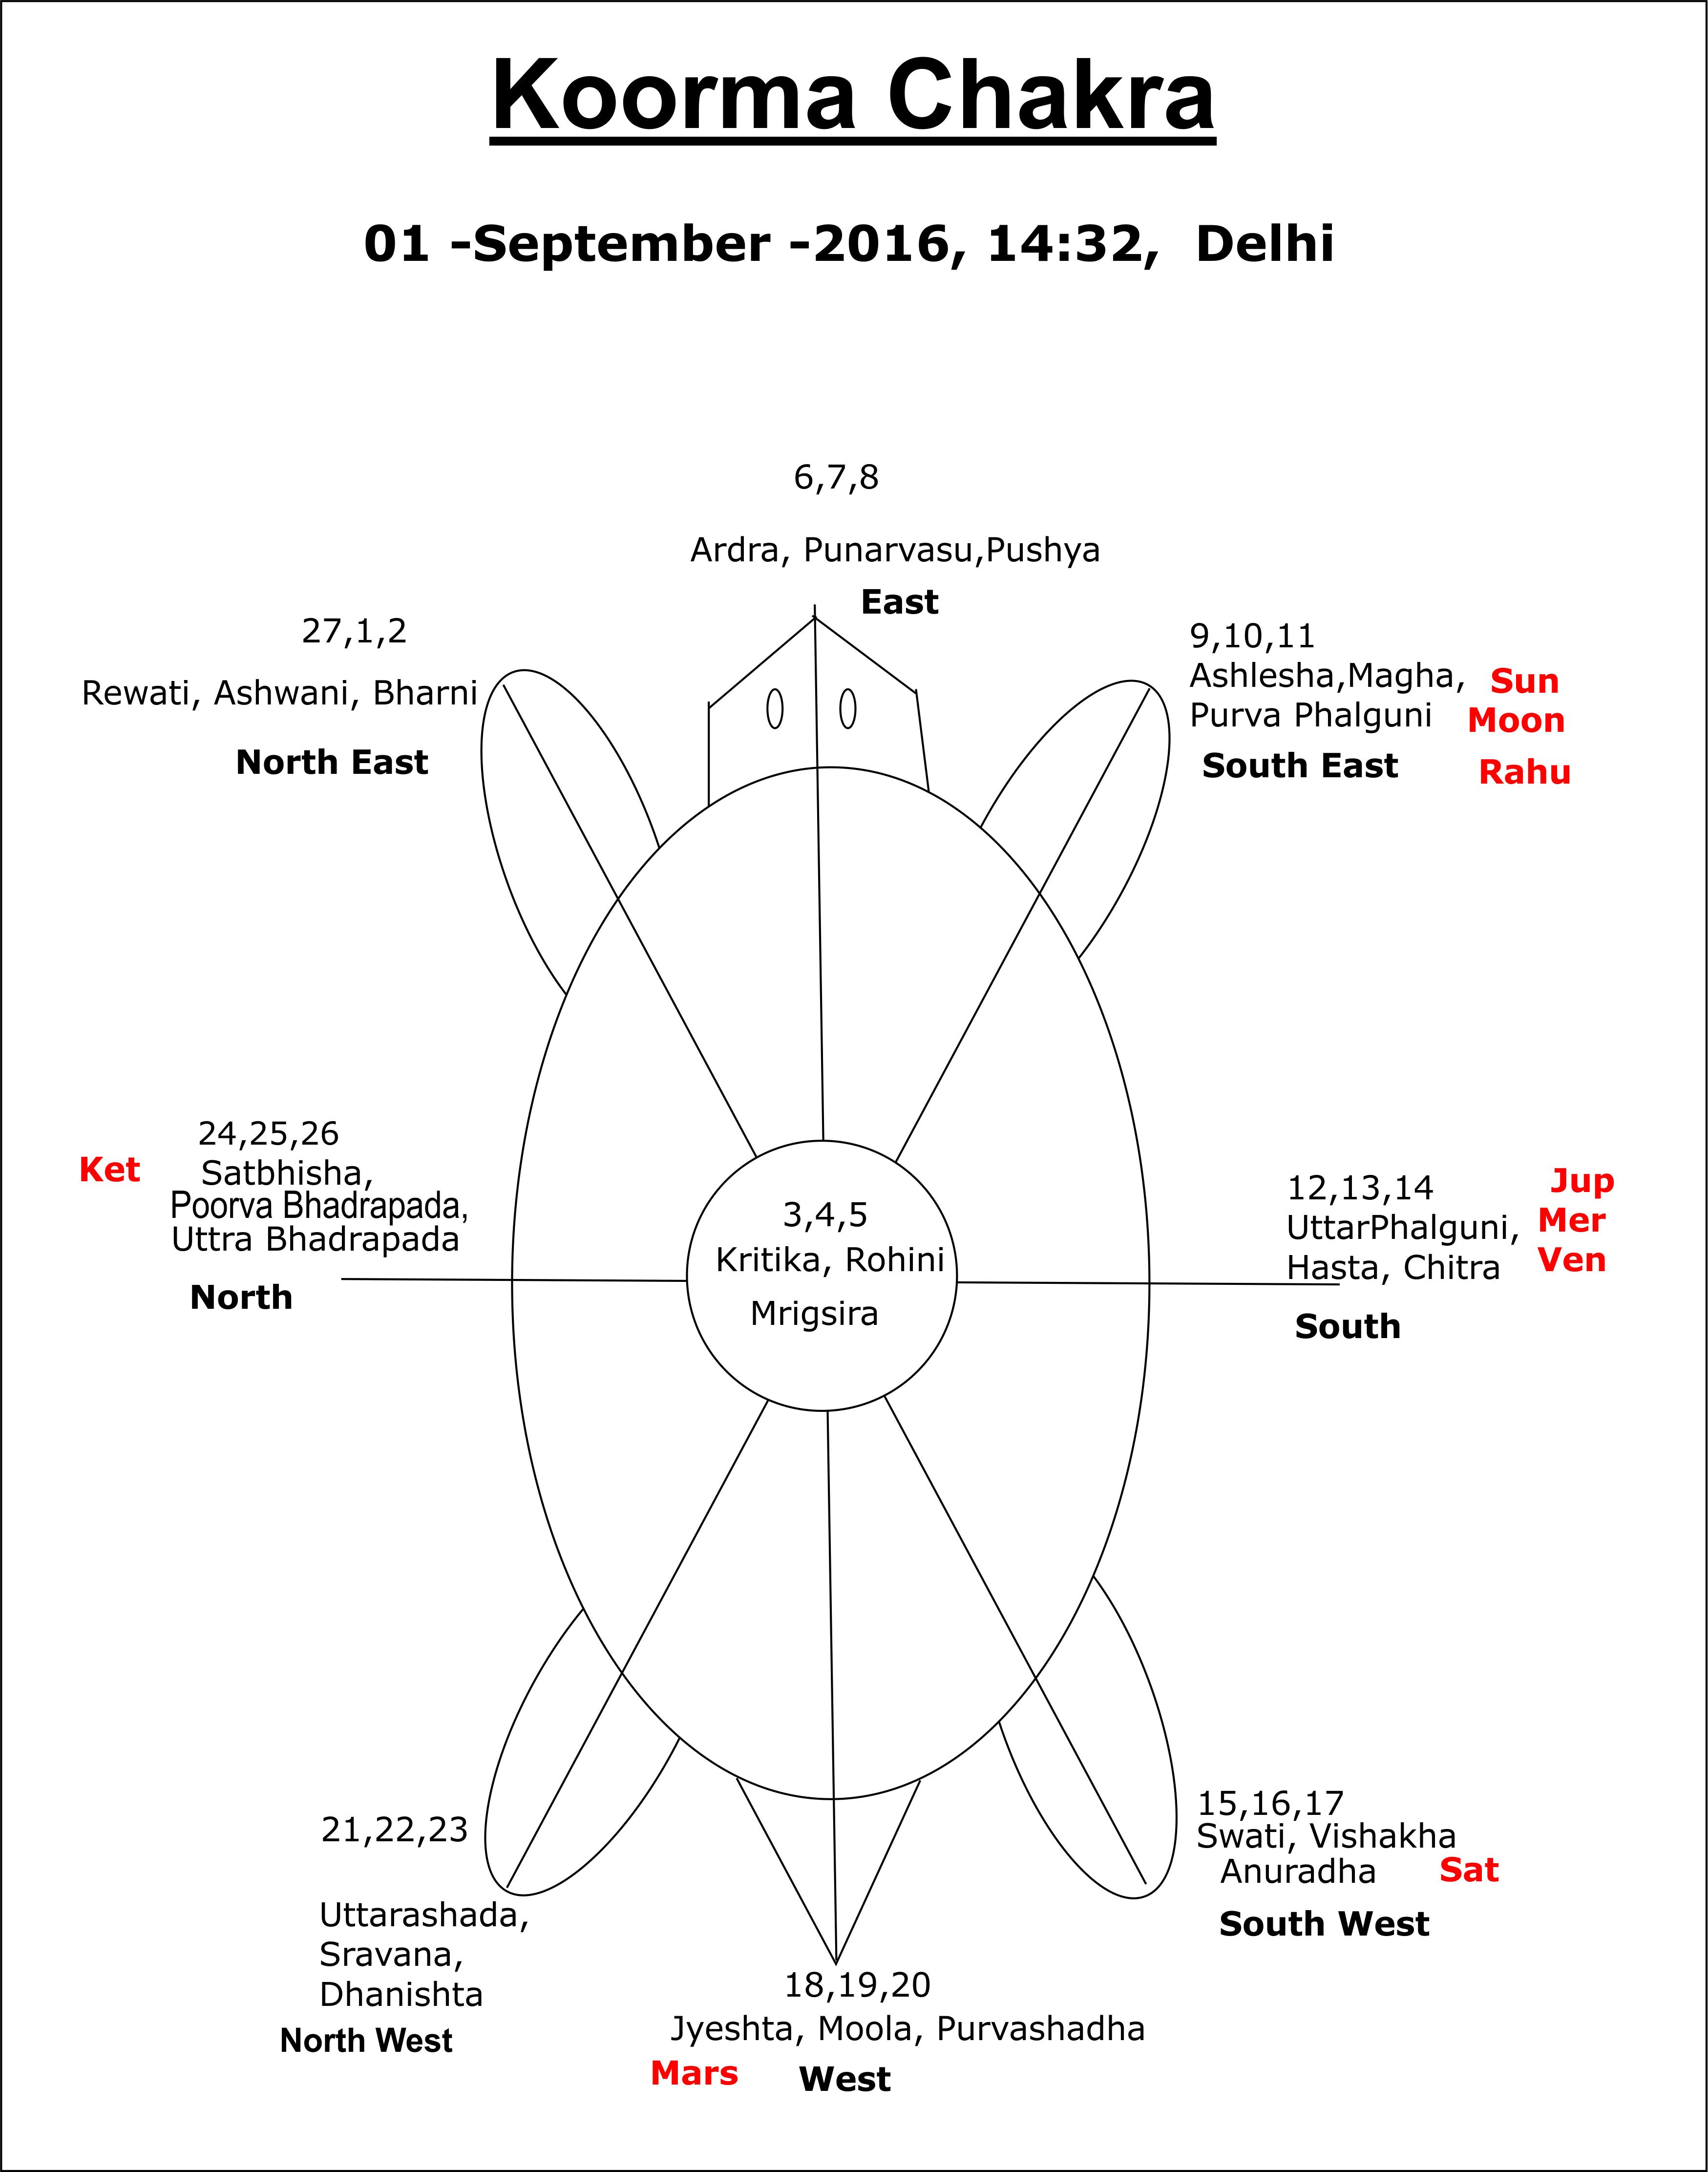 Koorma Chakra 1 September 2016